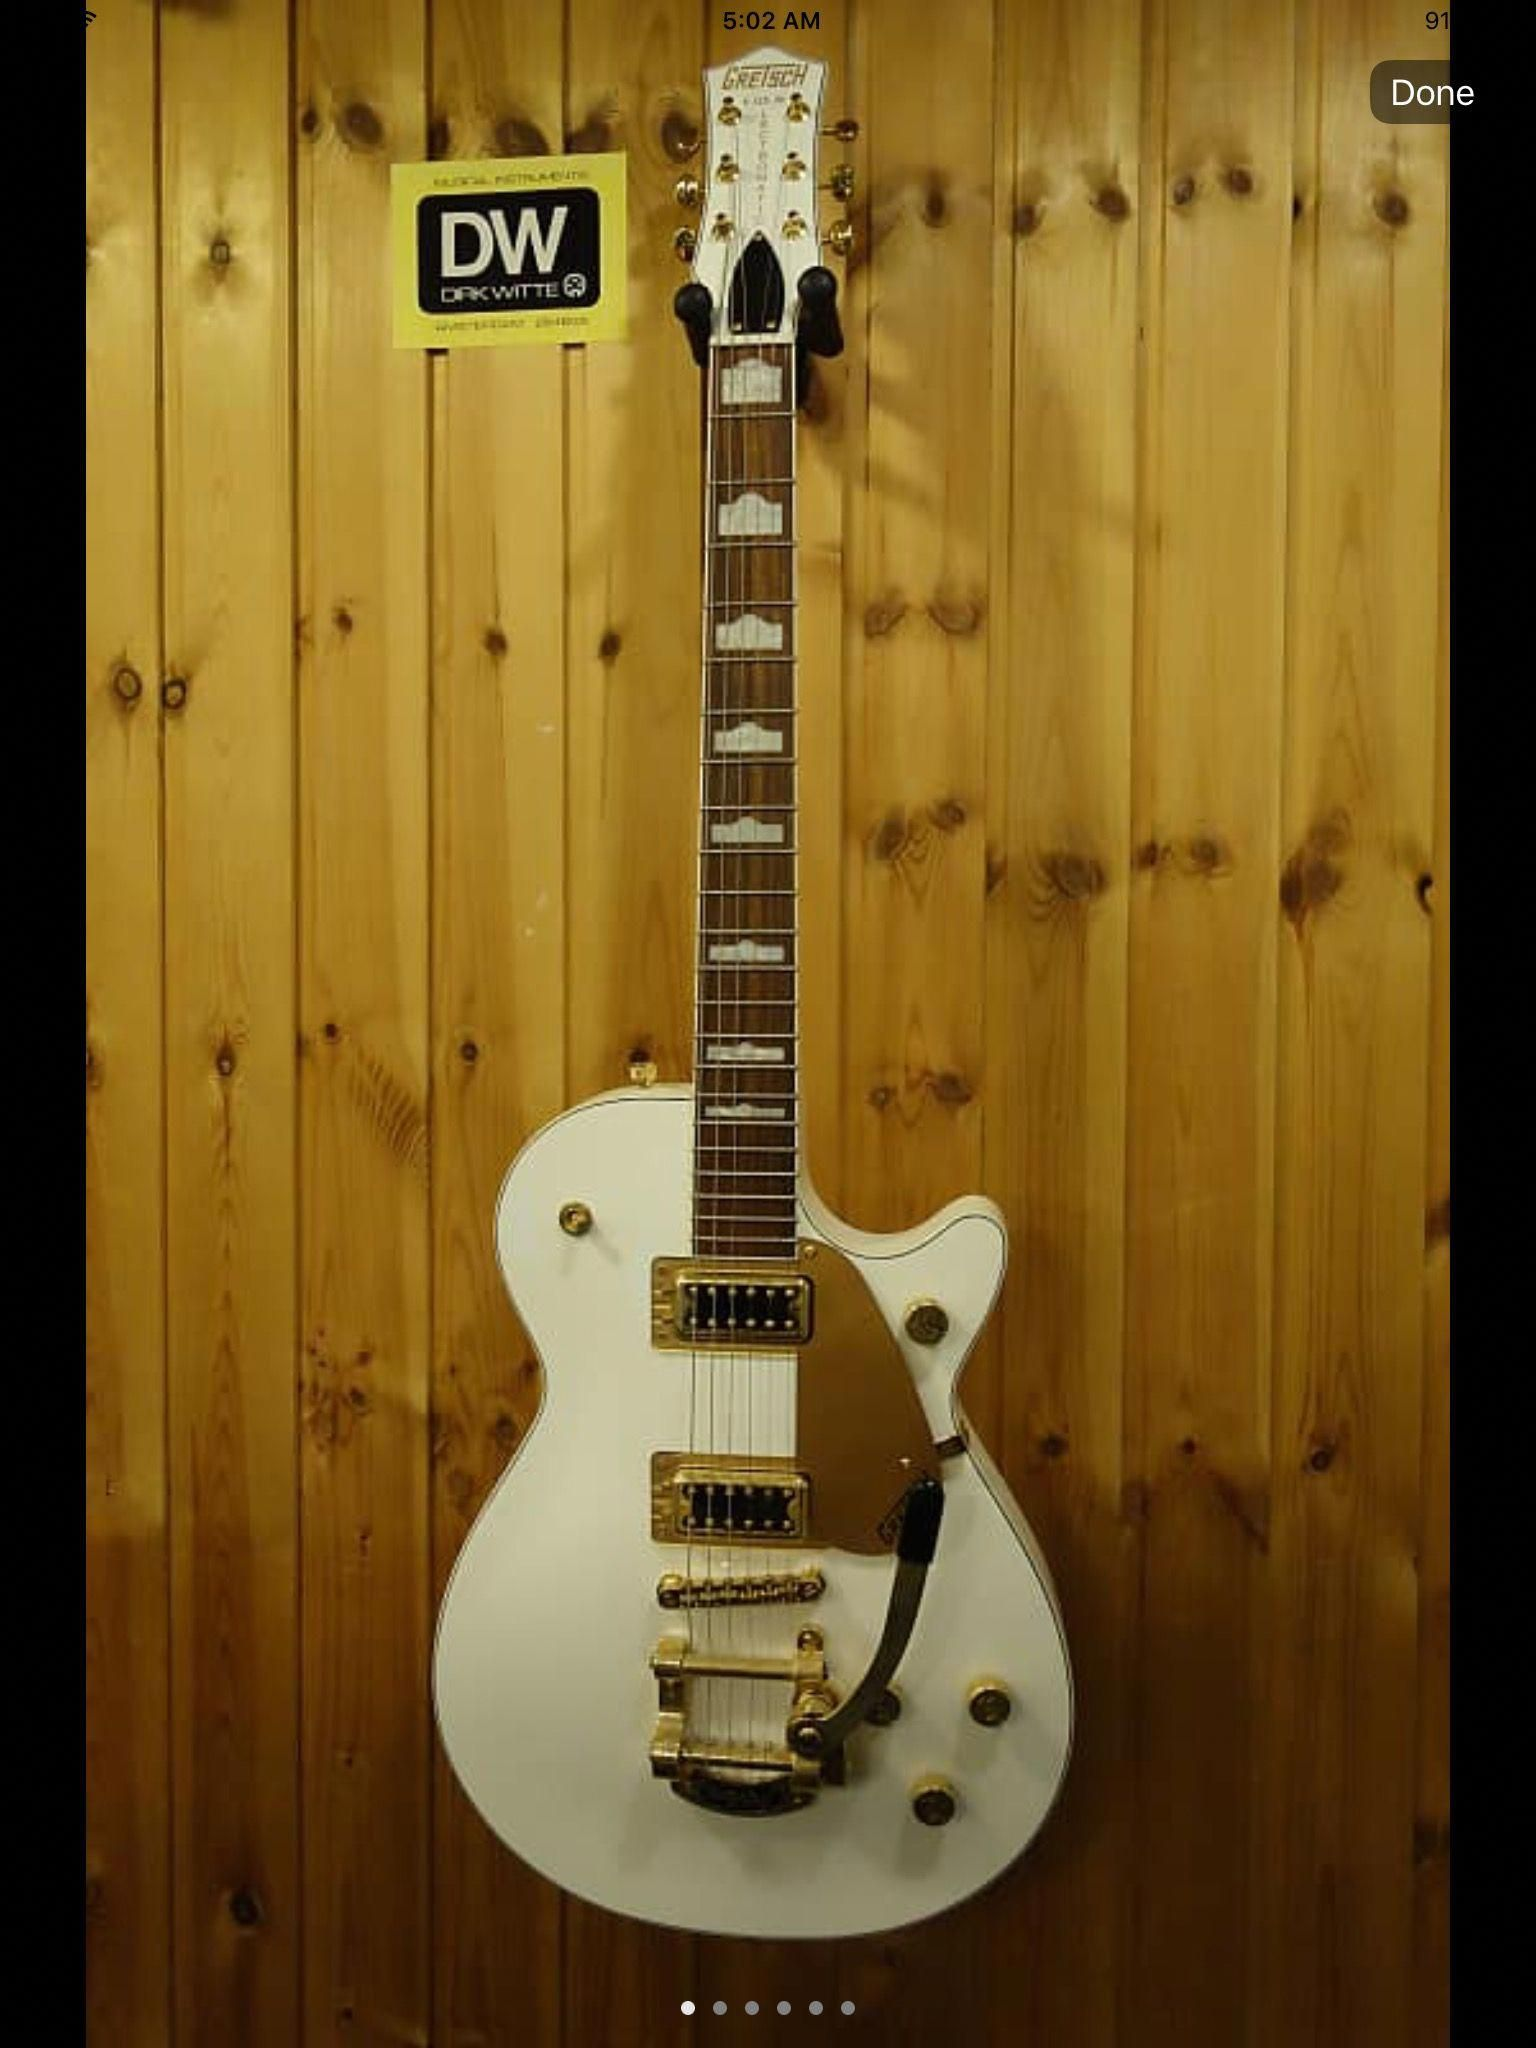 Gretsch guitar strap lock gretsch guitar electric